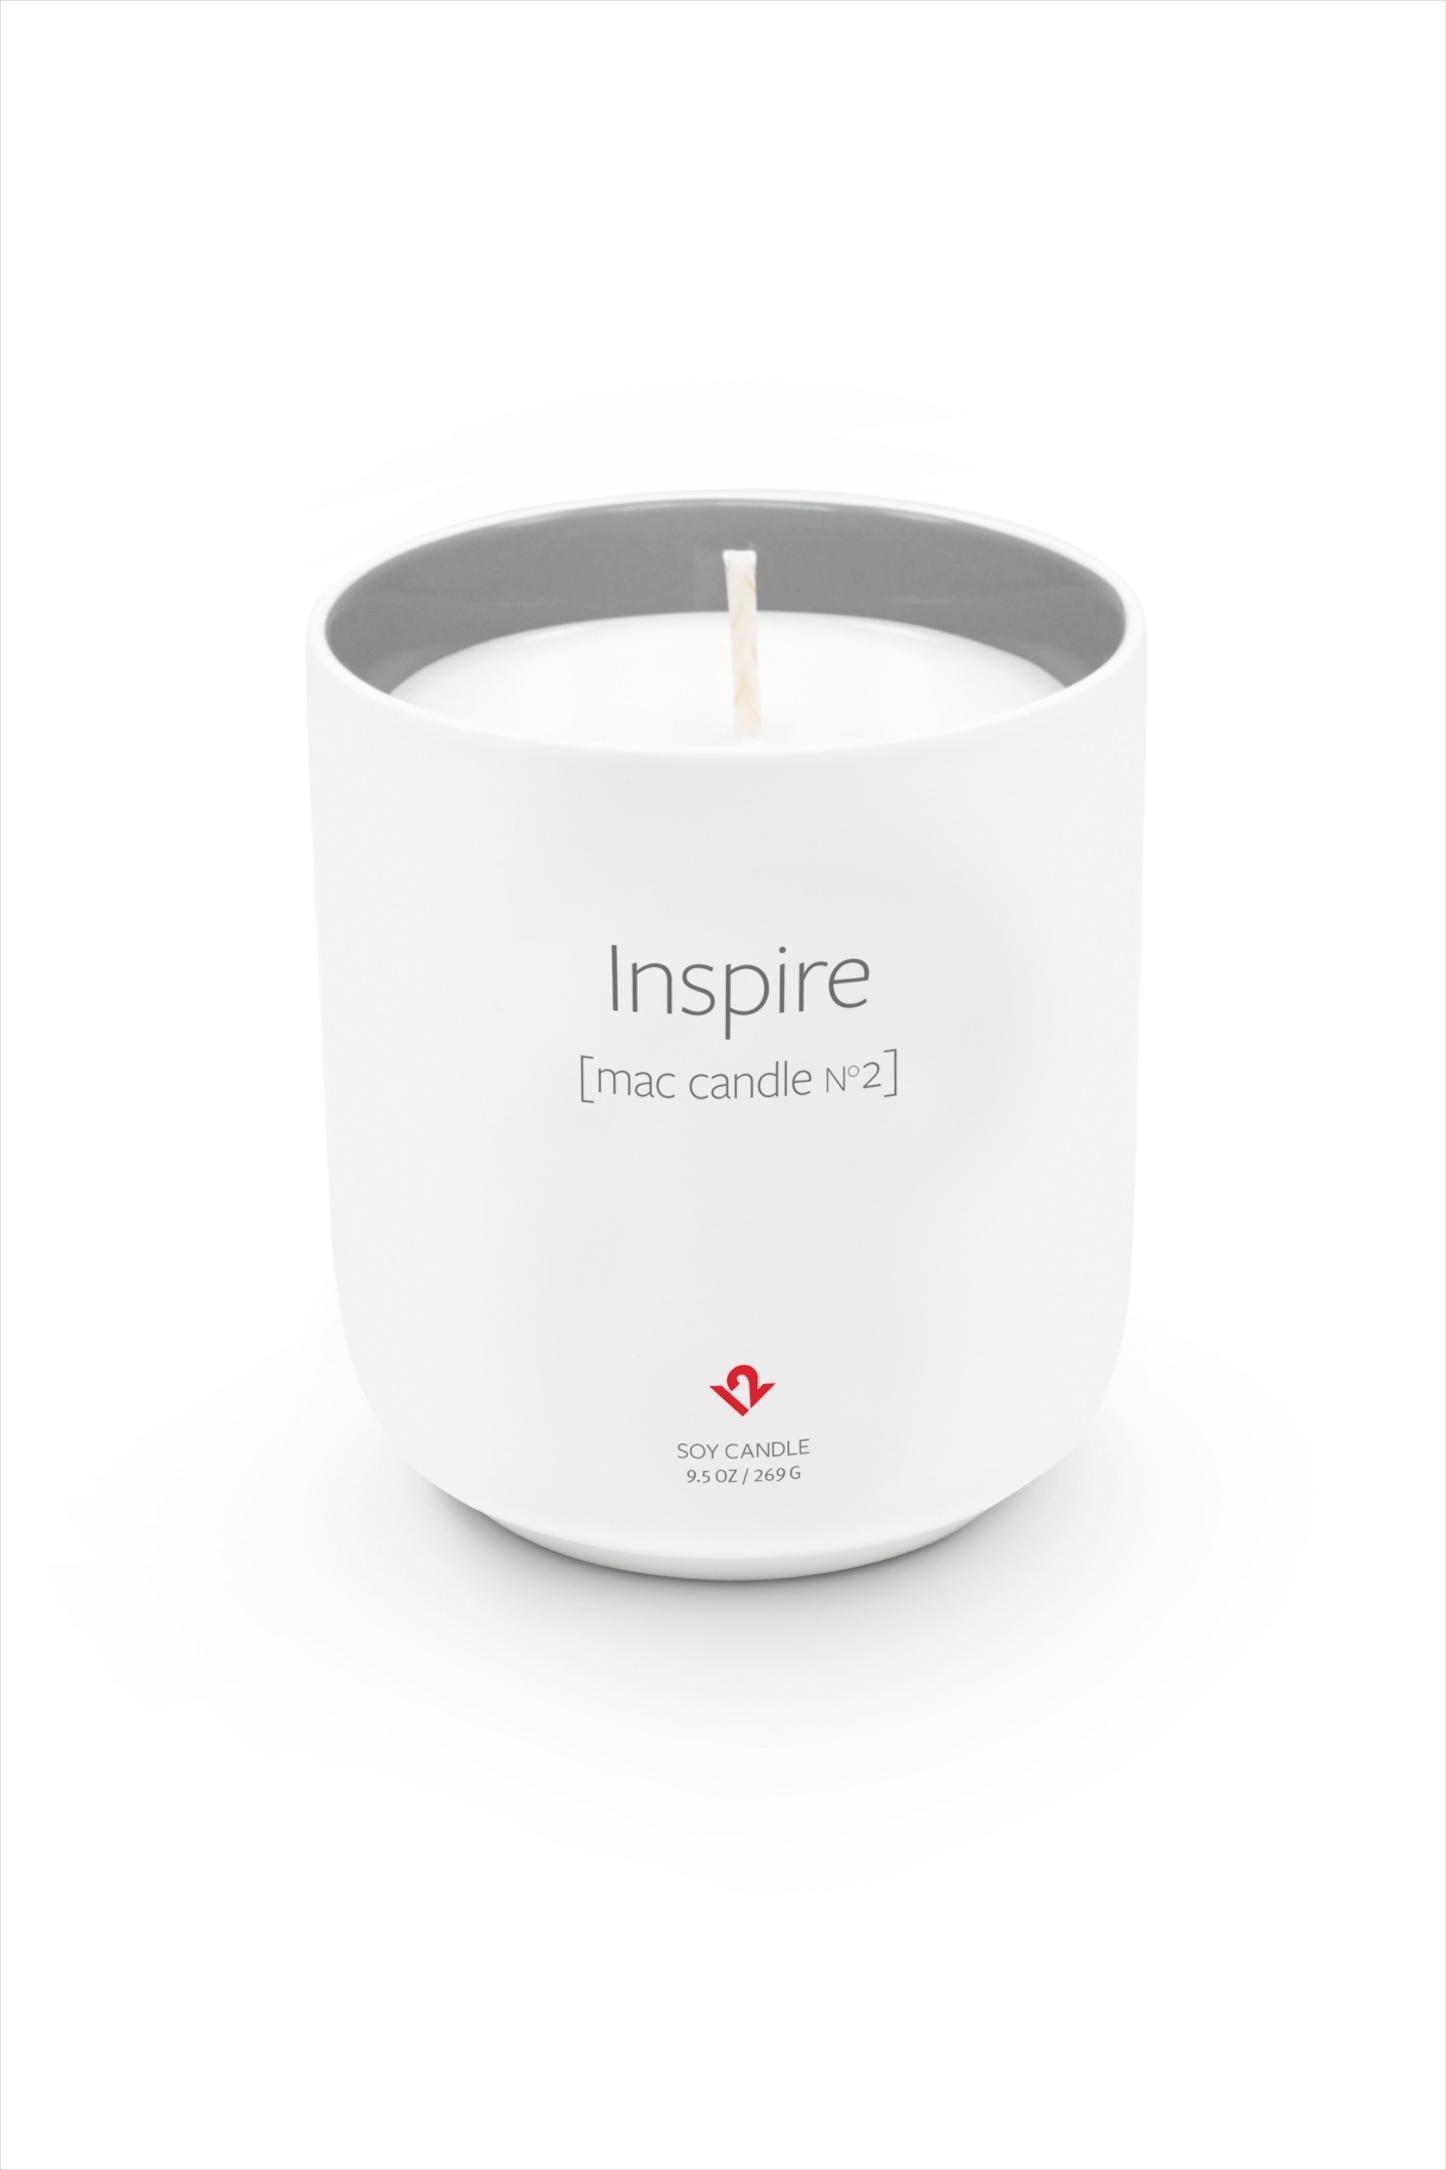 New-Mac-Candle-Inspire-05.jpg